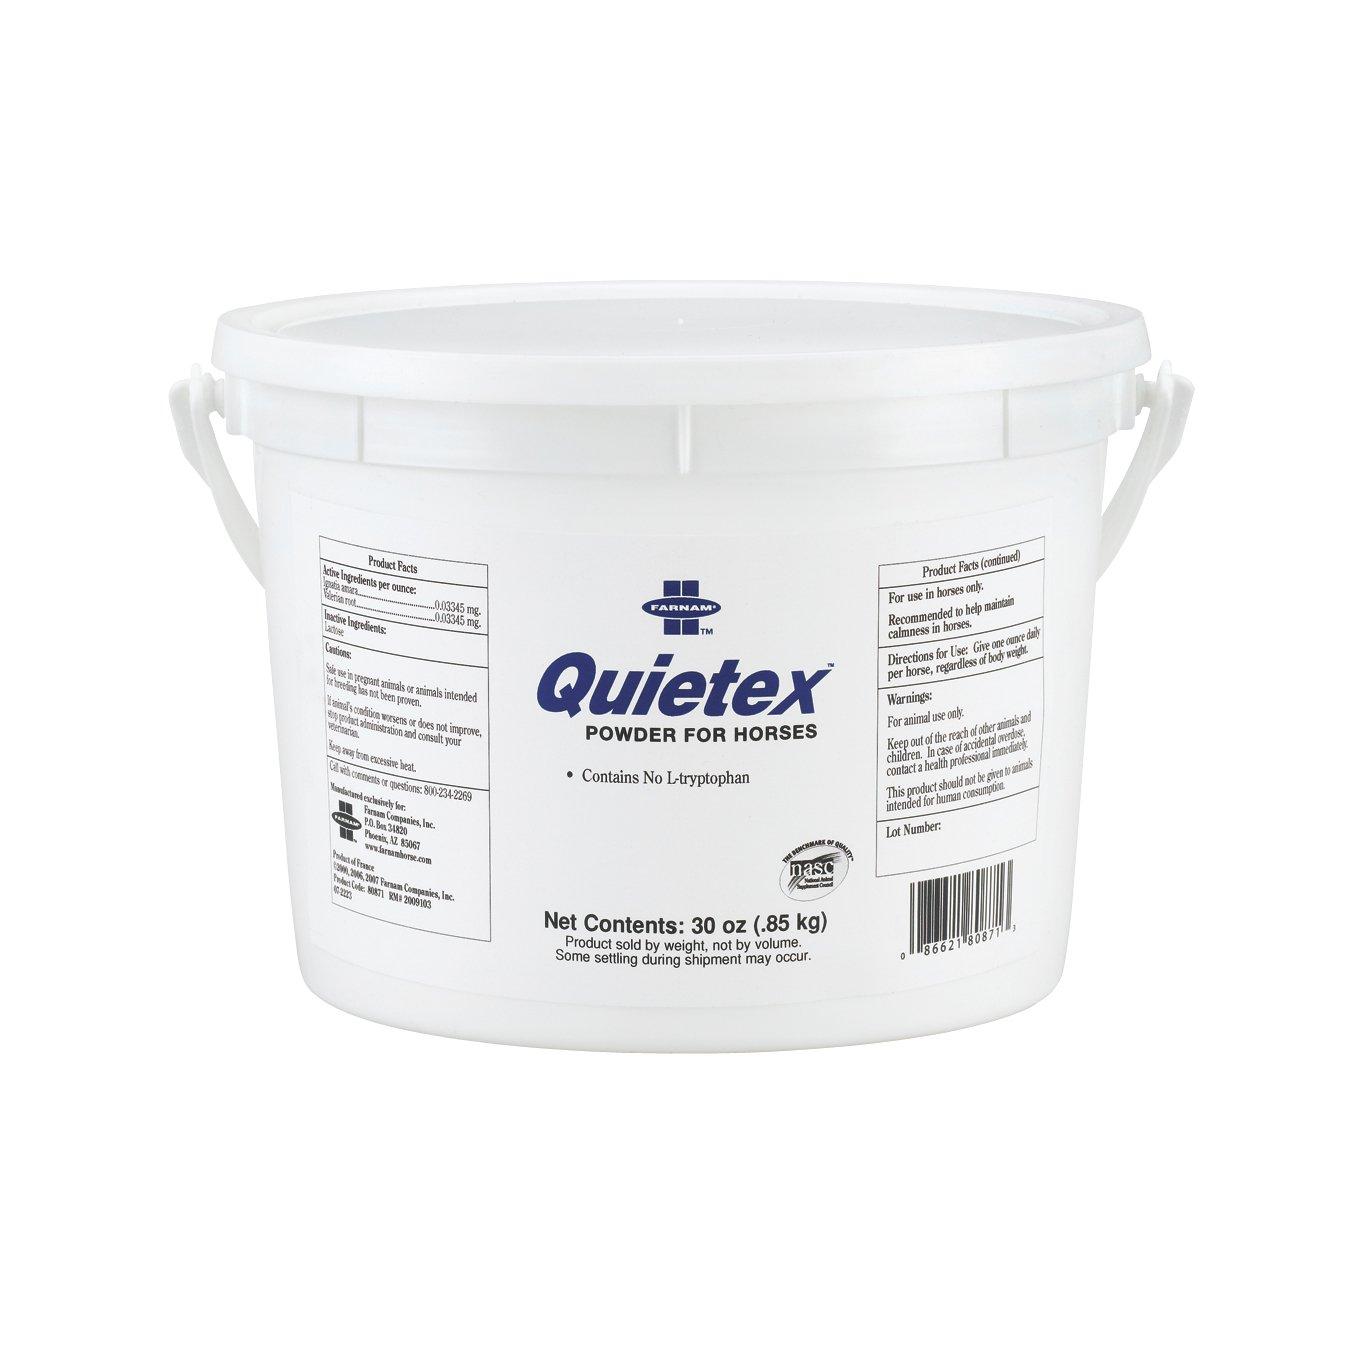 Quietex caballos. Pasta/polvos tranquilizante natural. Vetnova 100519743